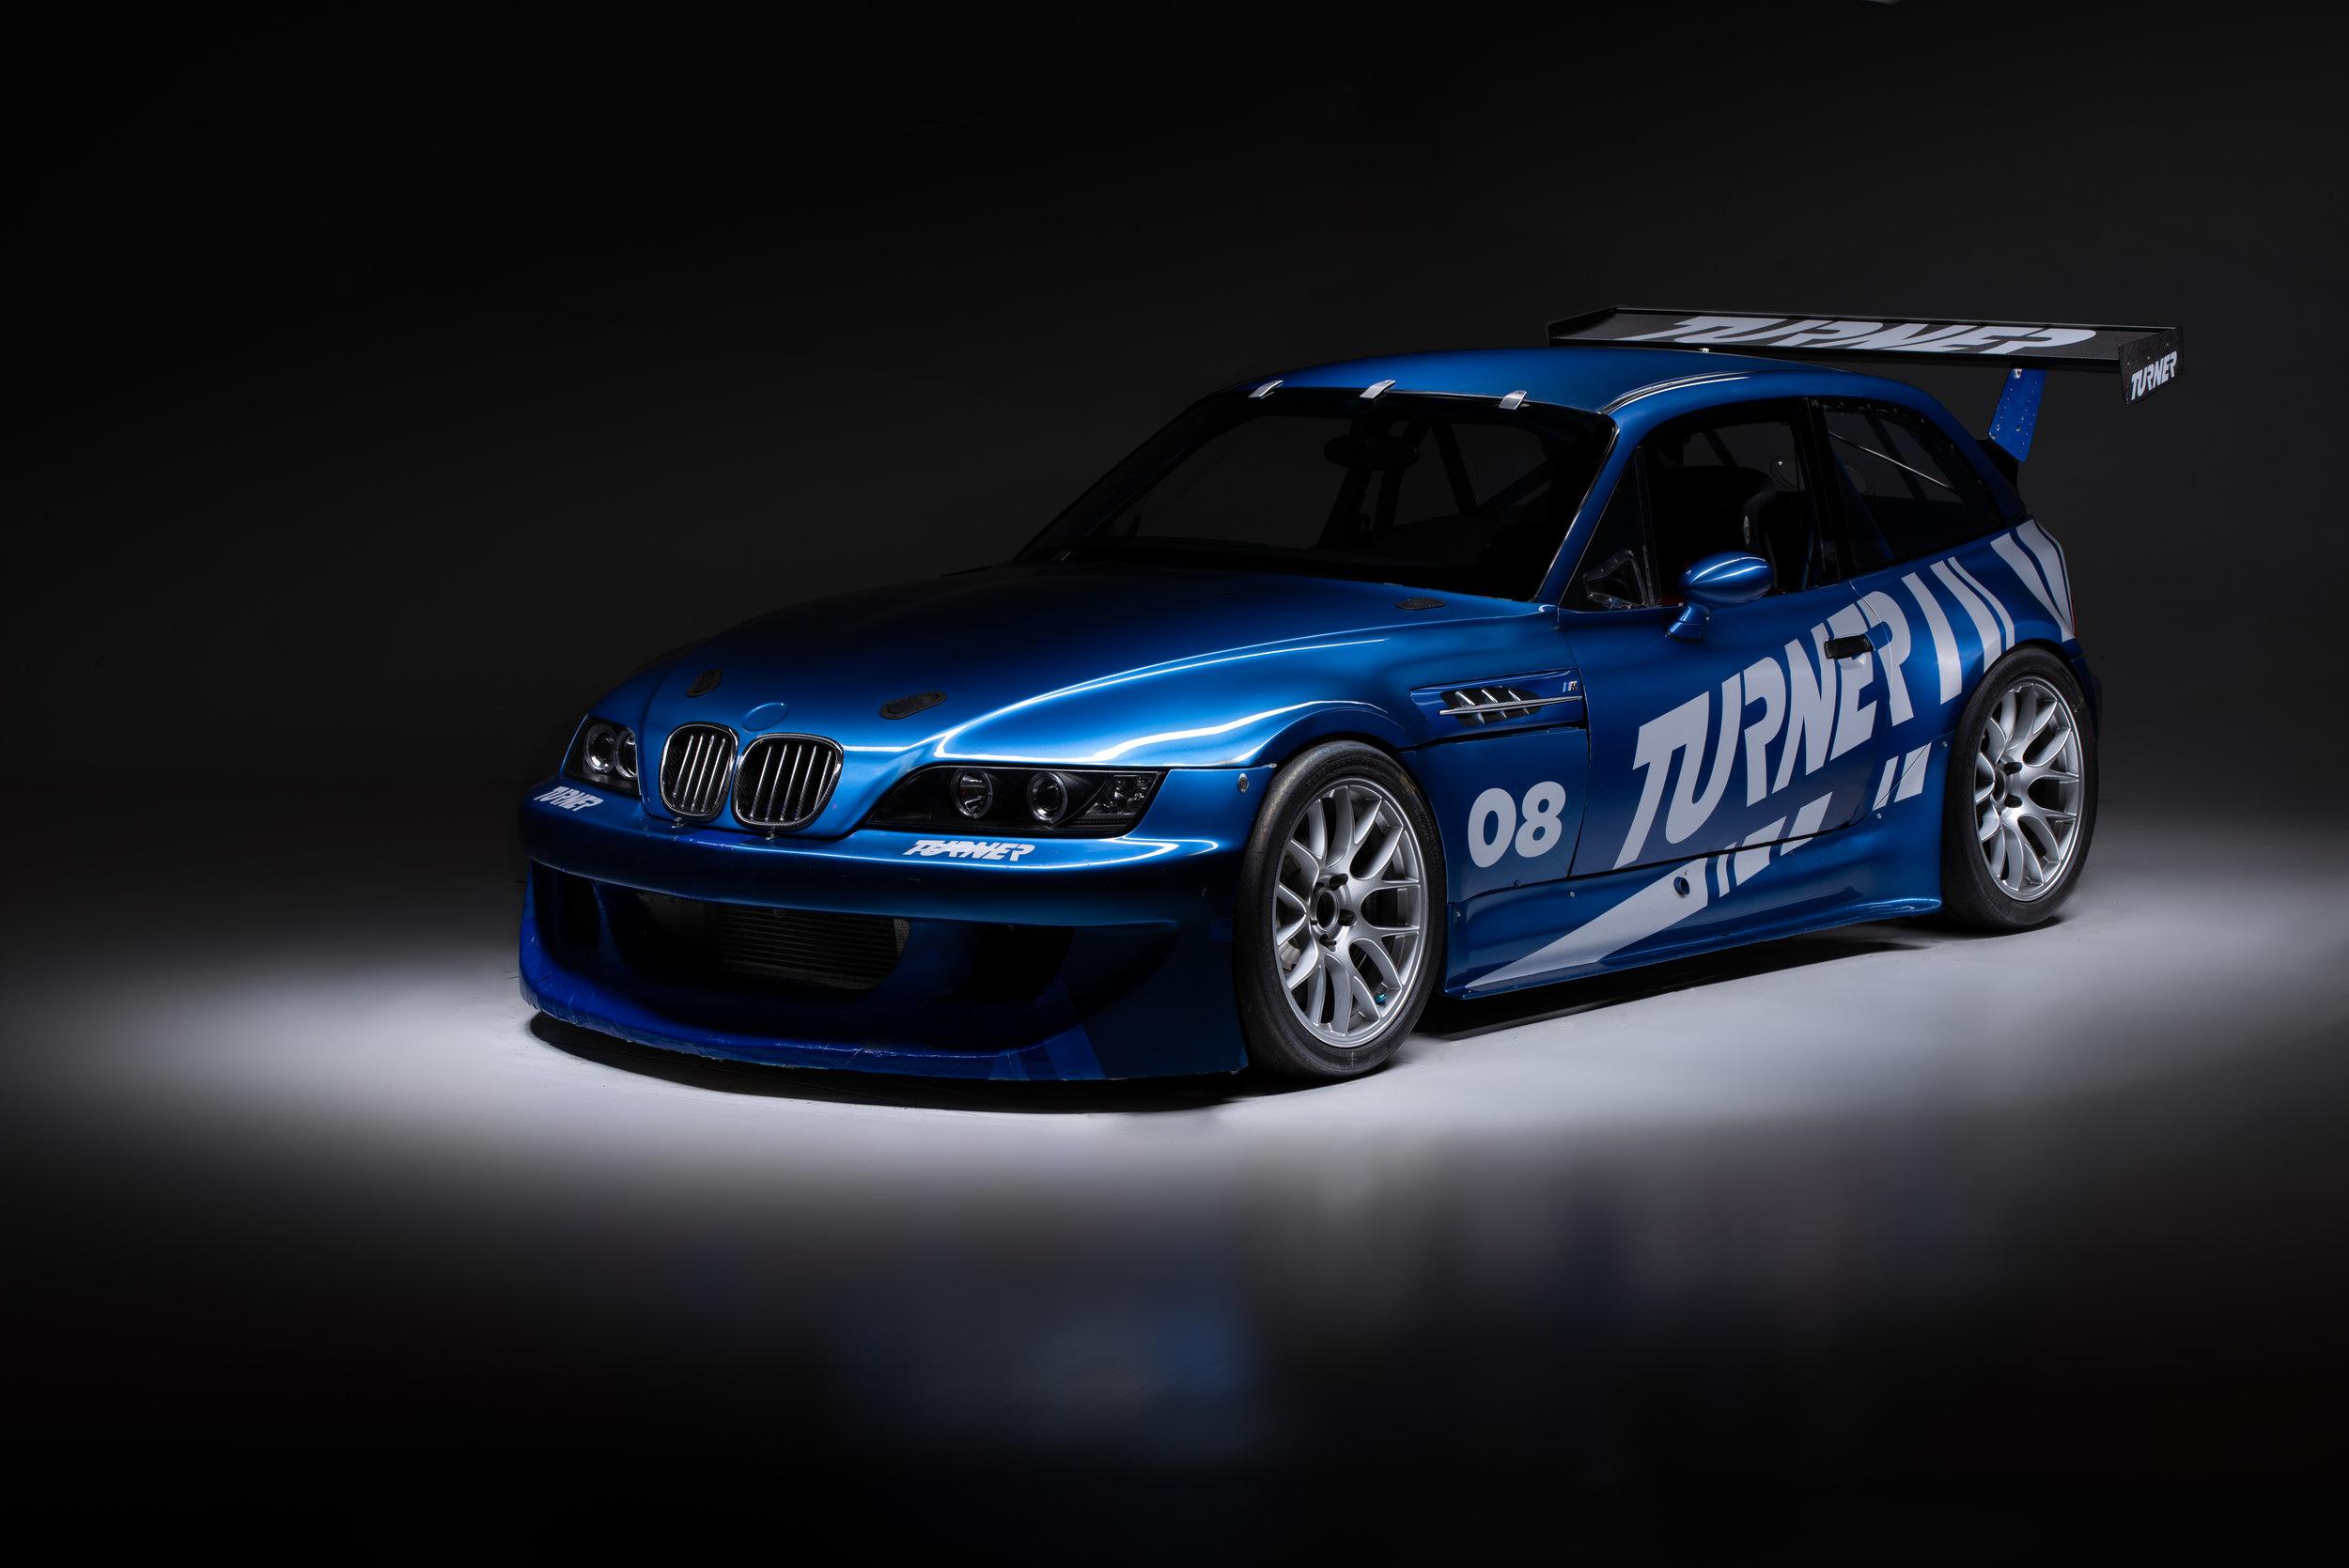 JB-Z3 M racecar-12-13-18-5.jpg